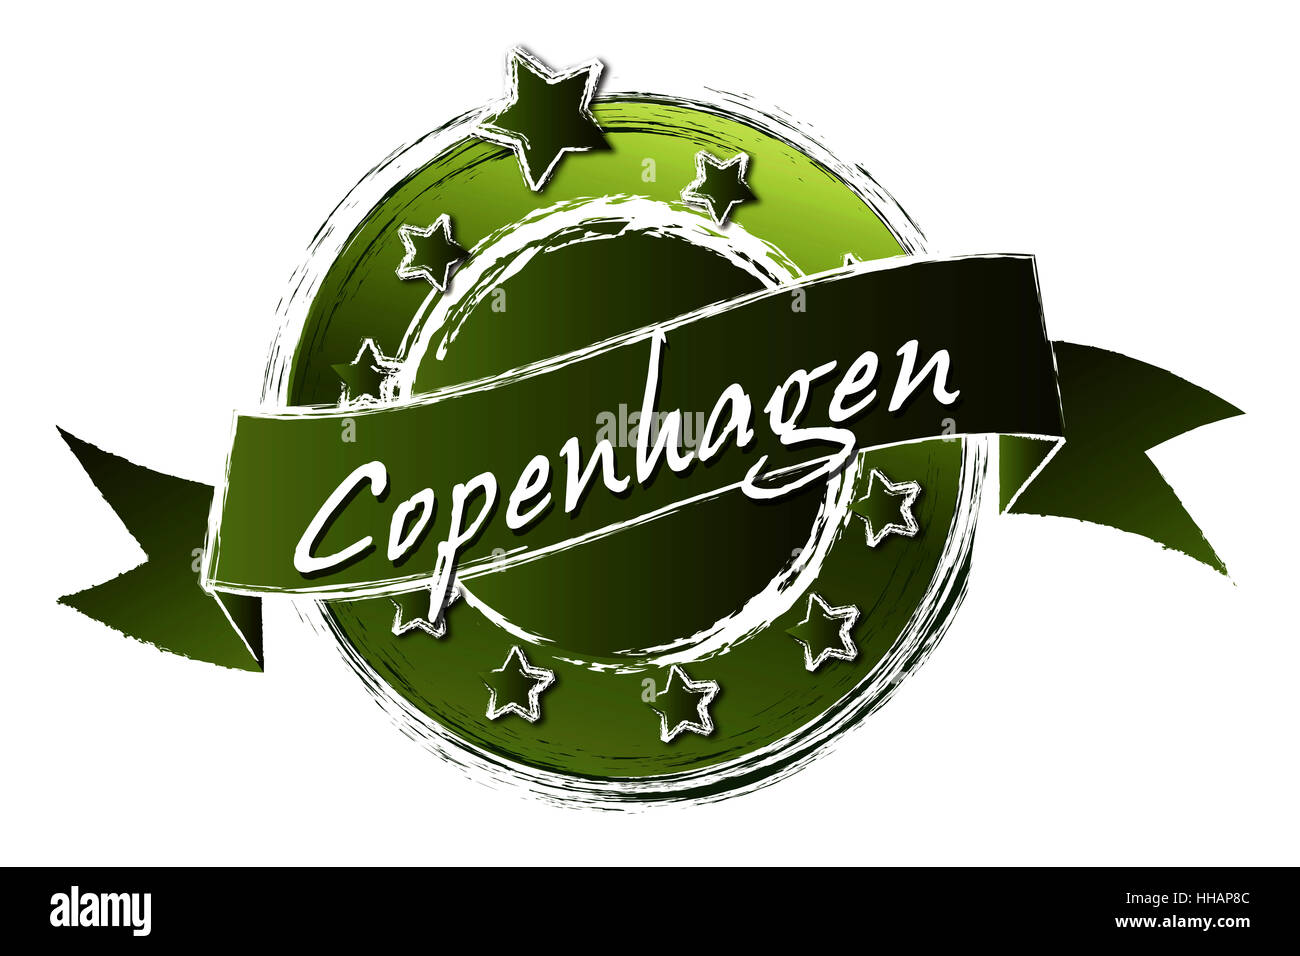 Grunge - Royal Copenhagen Banque D'Images